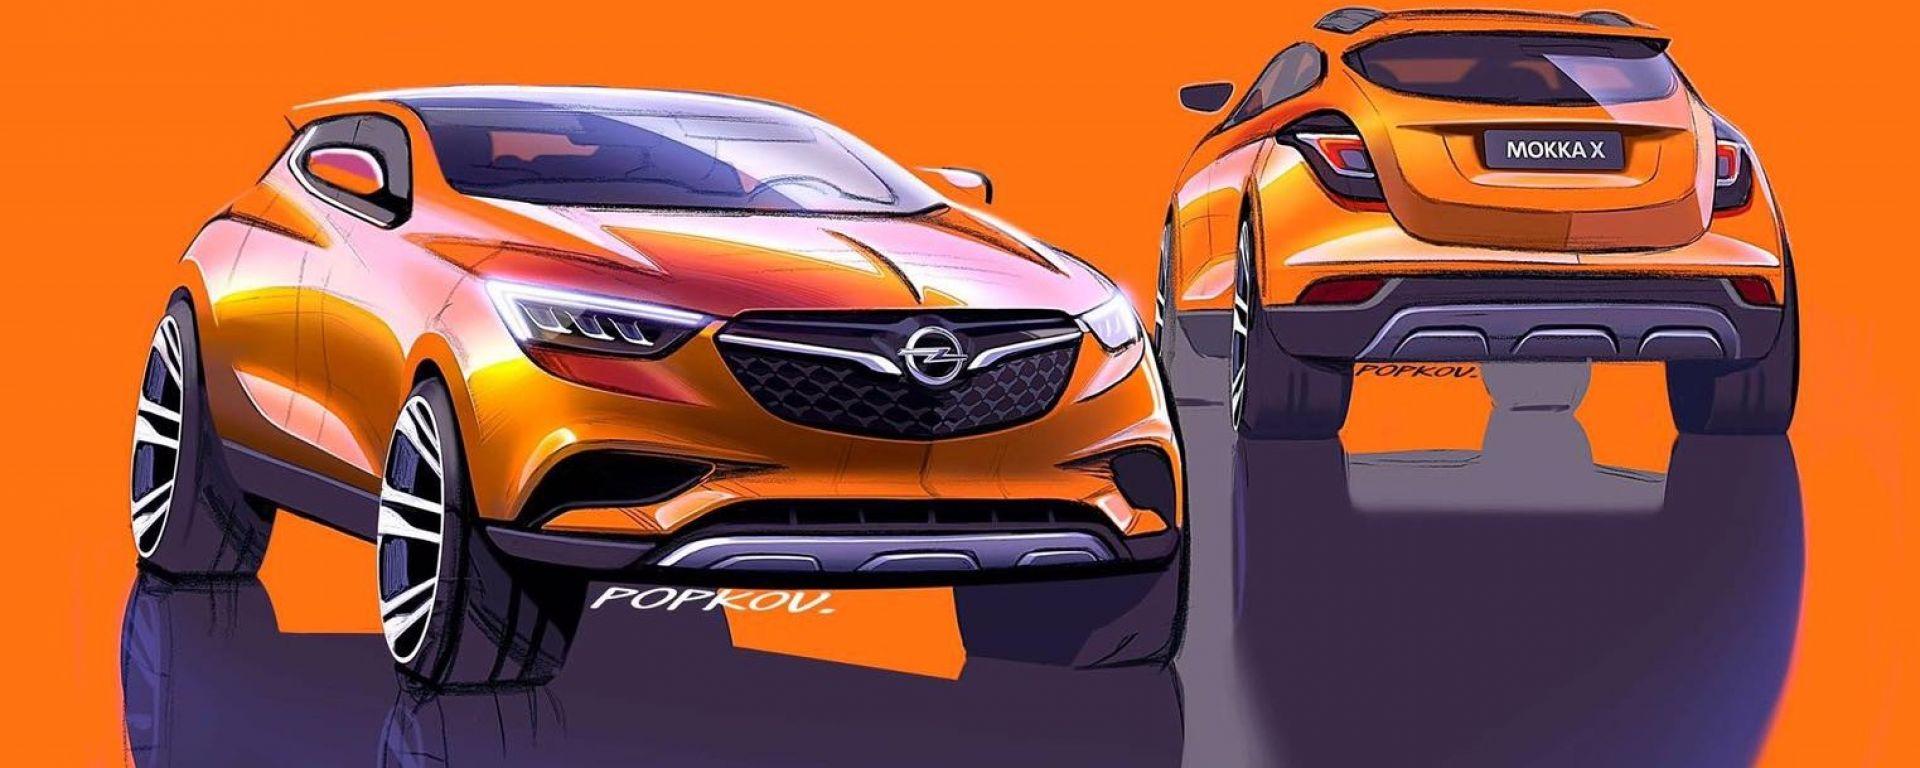 Nuova Opel Mokka X 2019 Anteprima Motori Prezzo Motorbox